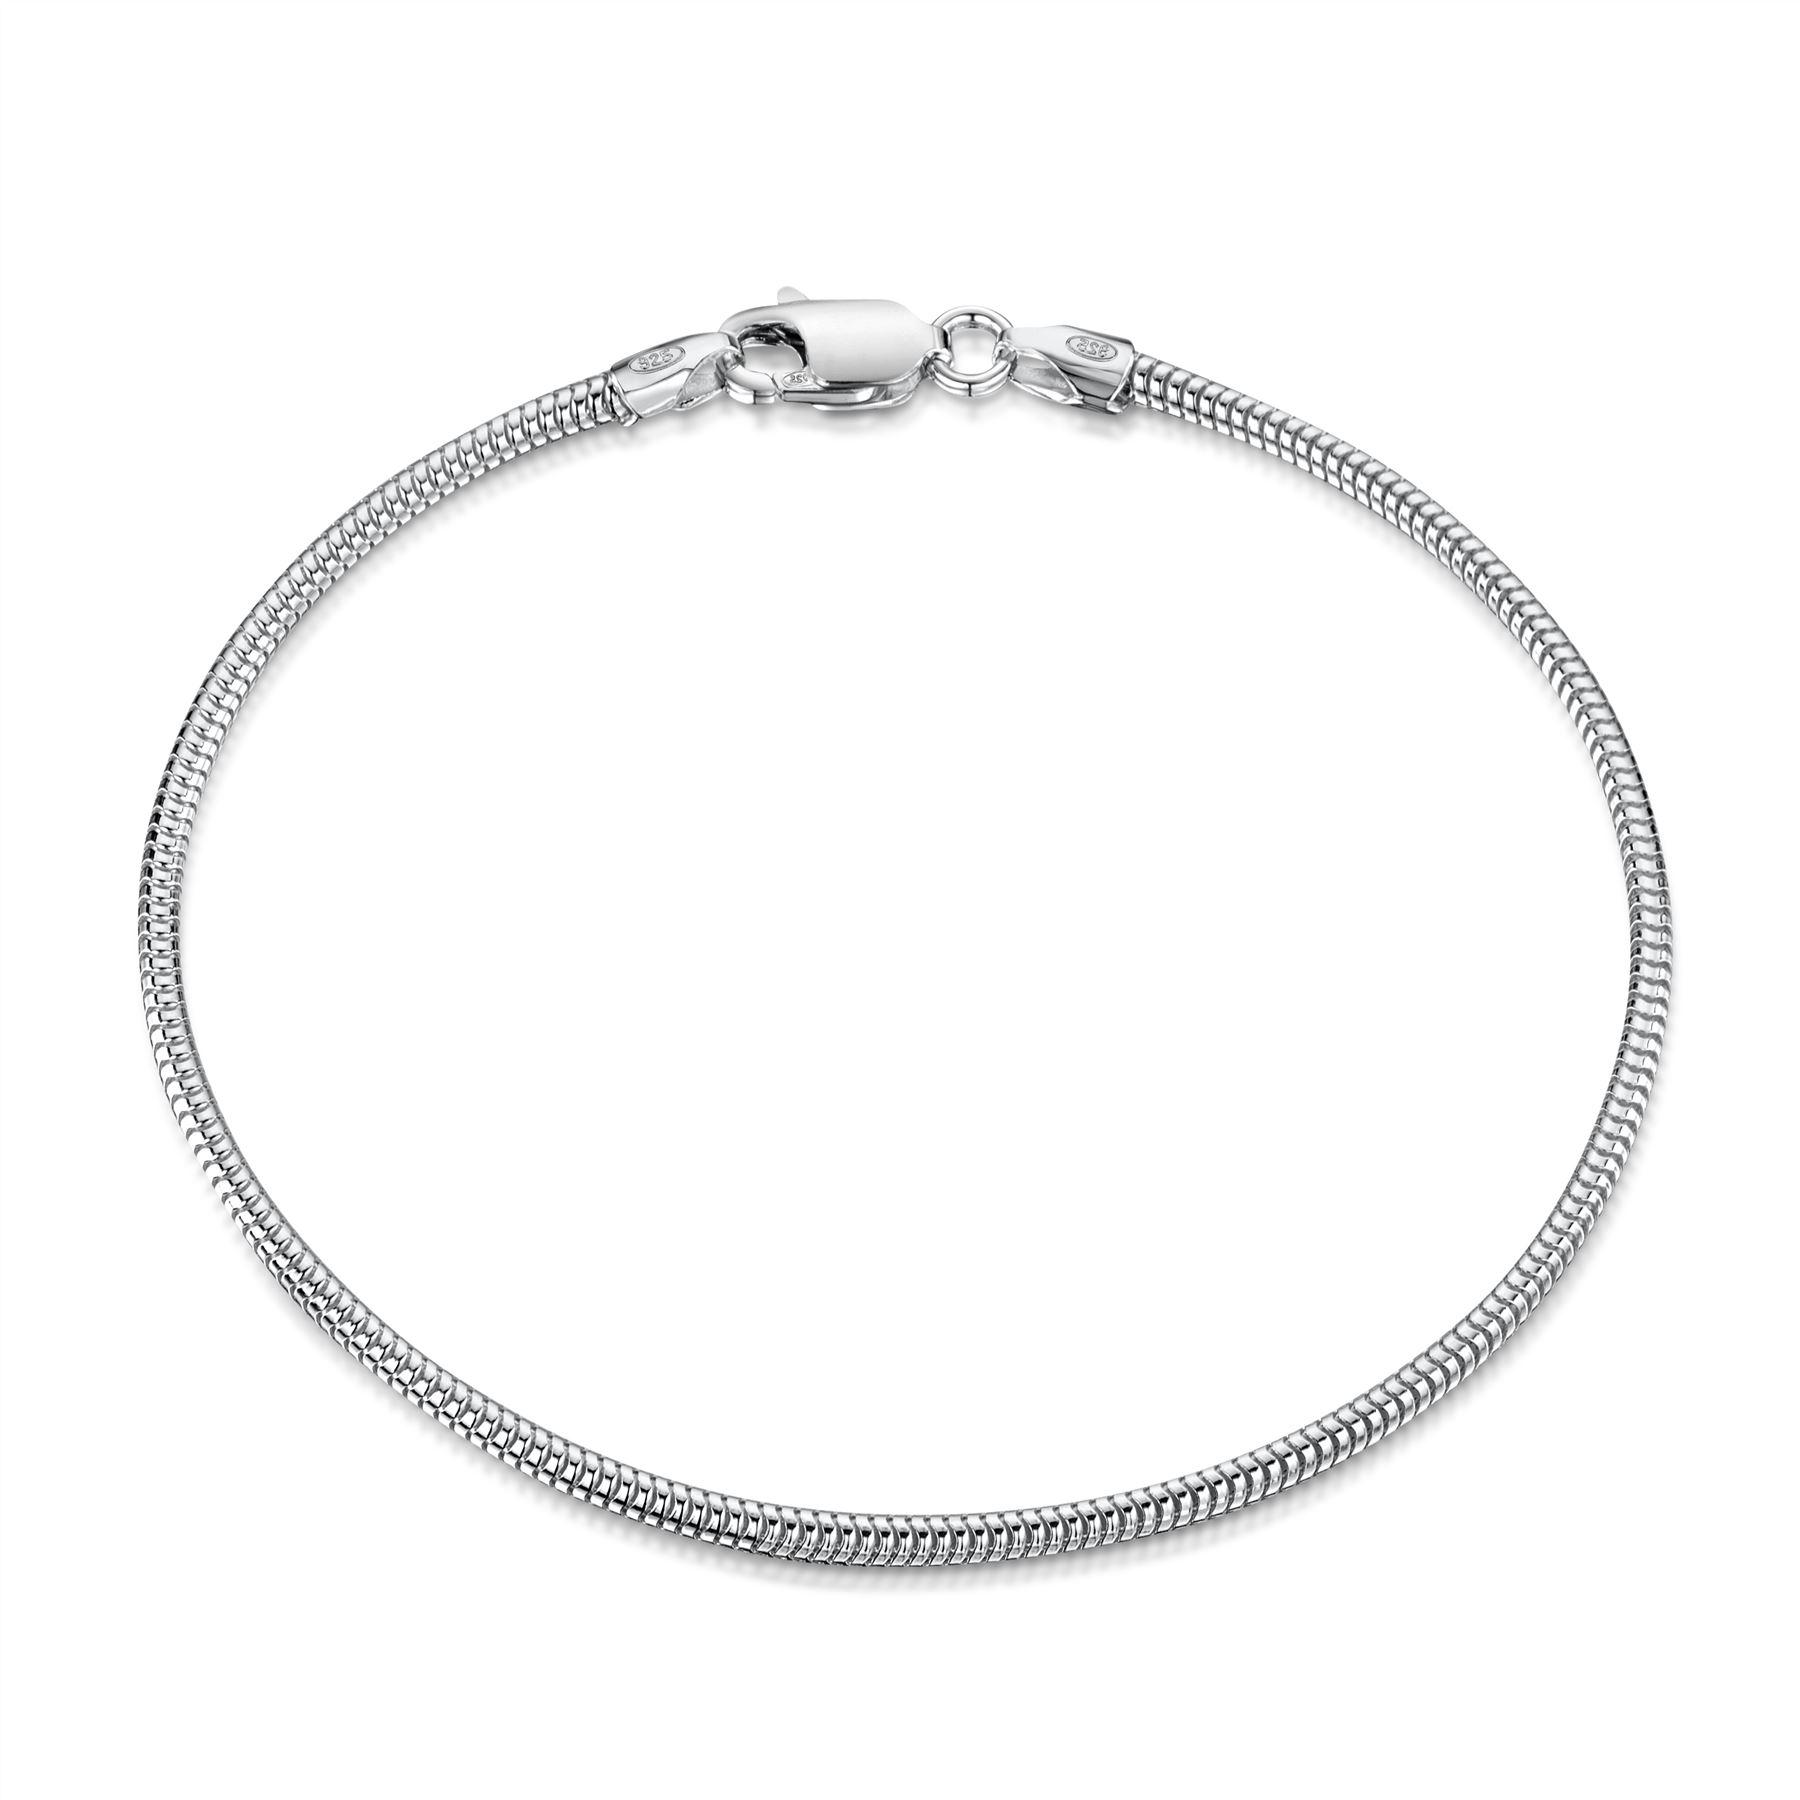 Amberta-Pulsera-en-Autentica-Plata-De-Ley-925-Brazalete-Precioso-para-Mujer miniatura 37